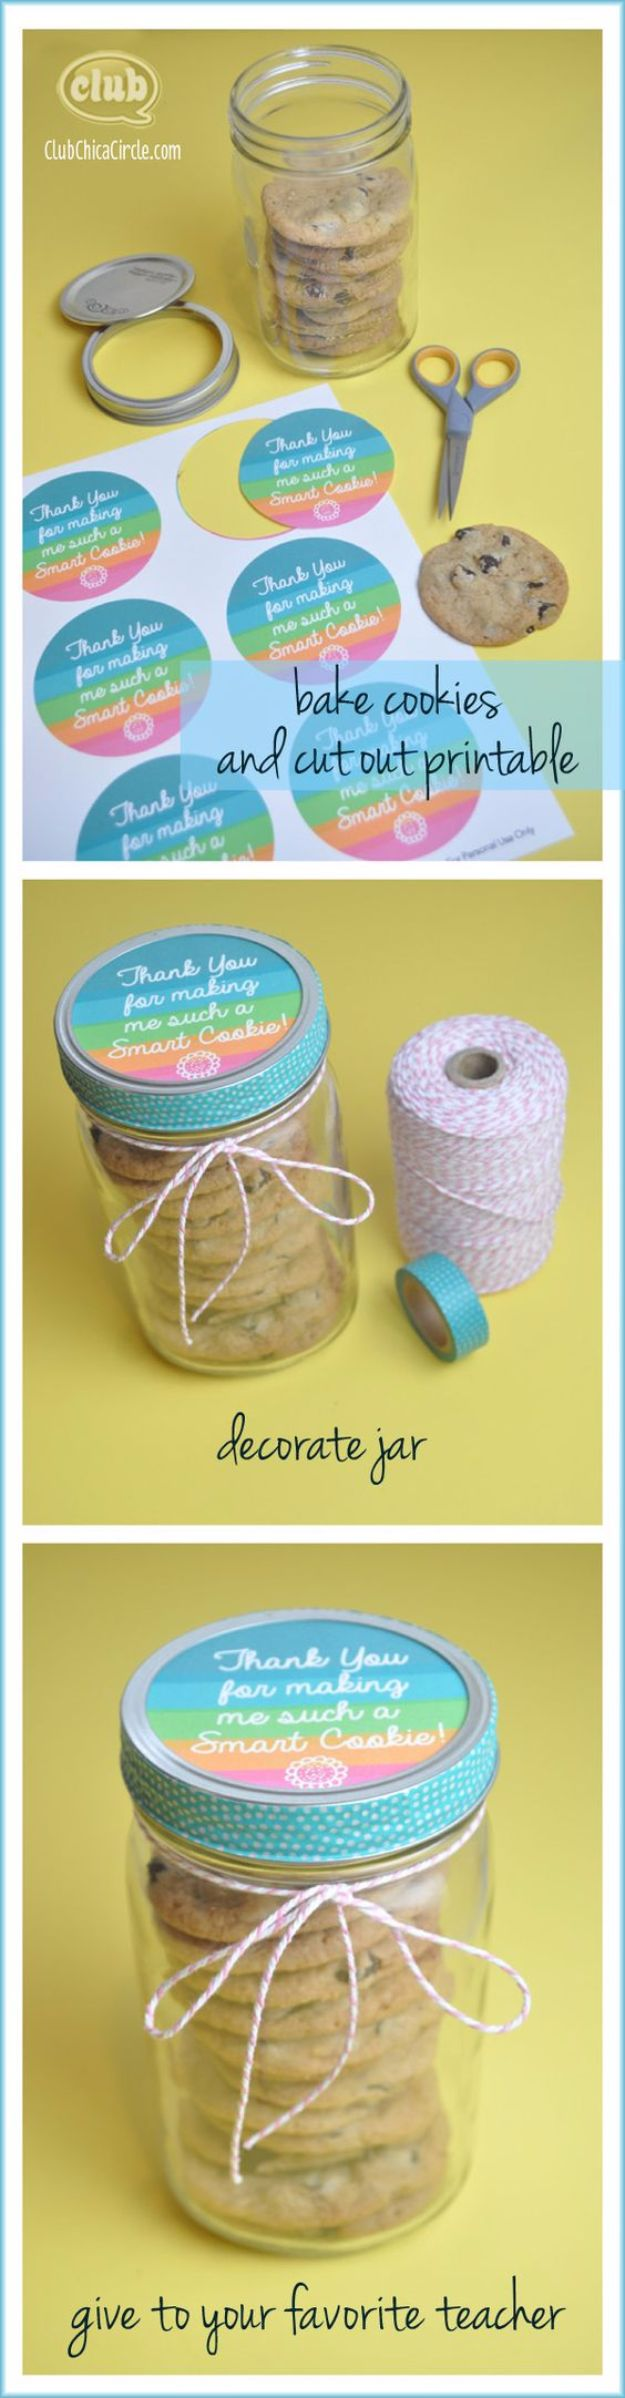 Free Printables for Mason Jars - Mason Jar Gift With Free Printables - Best Ideas for Tags and Printable Clip Art for Fun Mason Jar Gifts and Organization#masonjar #crafts #printables